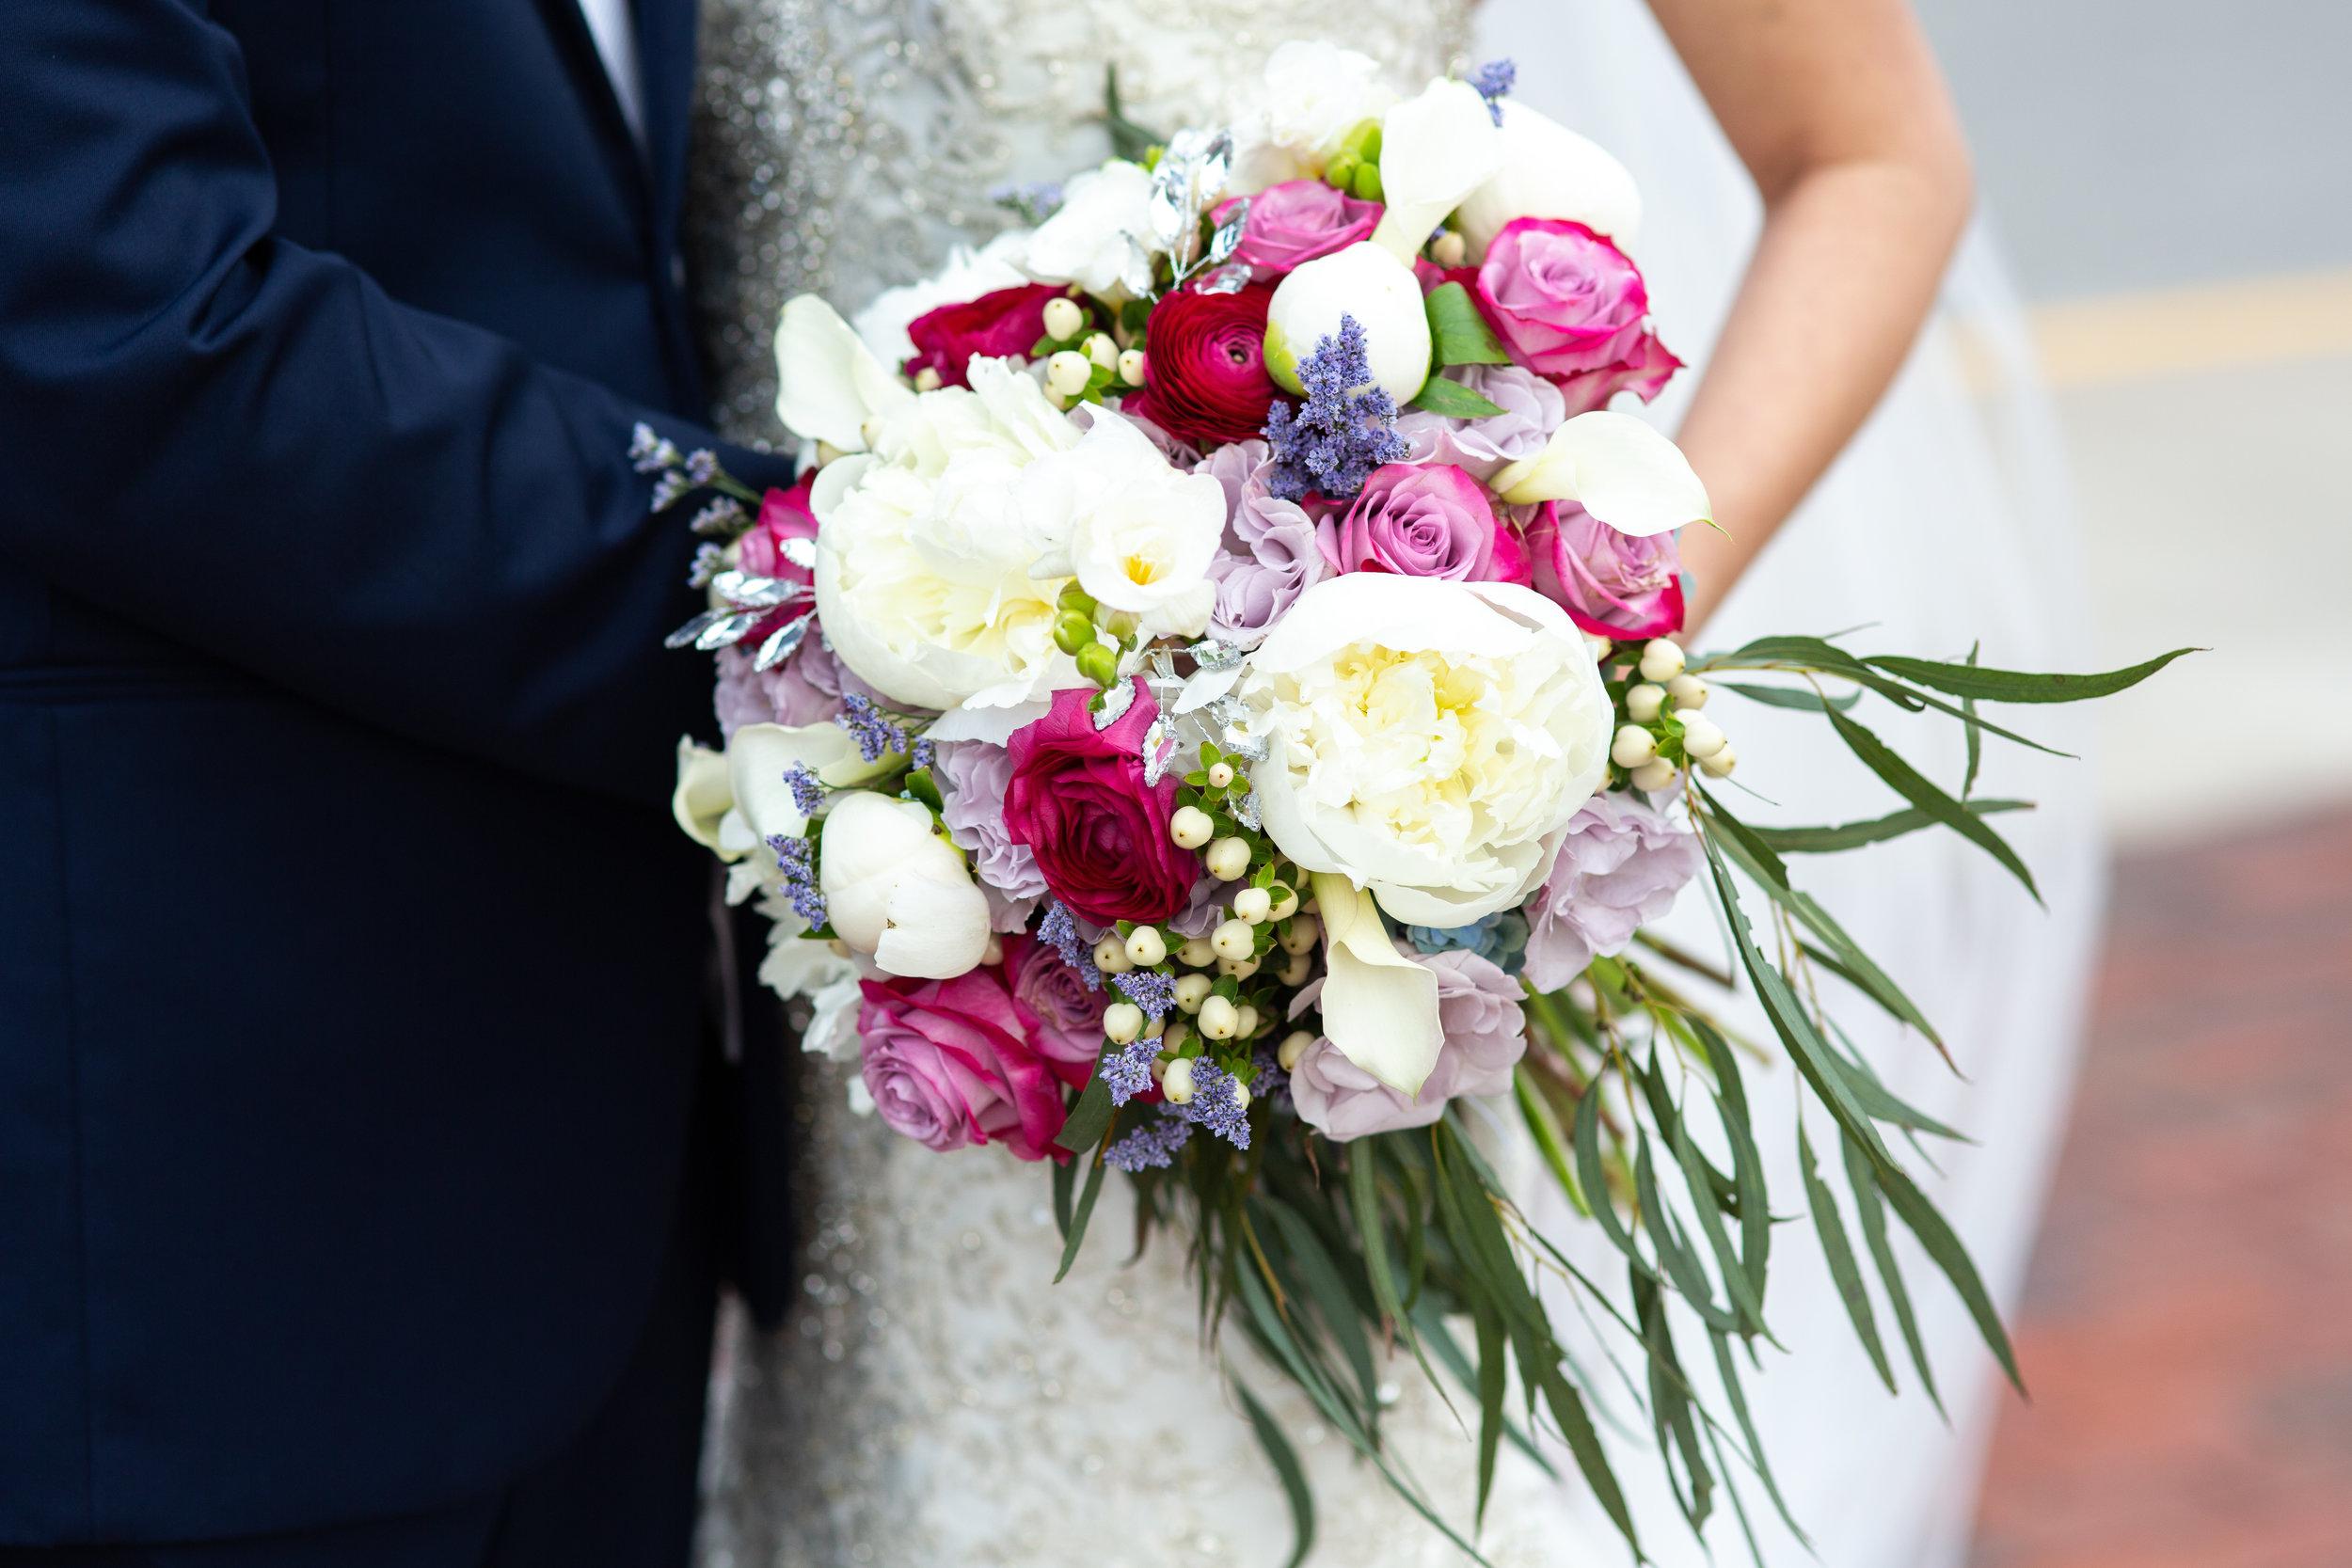 FREEWedding Guide - FREE One sheet wedding planning guide! Plan your ENTIRE wedding on ONE sheet! Click HERE!